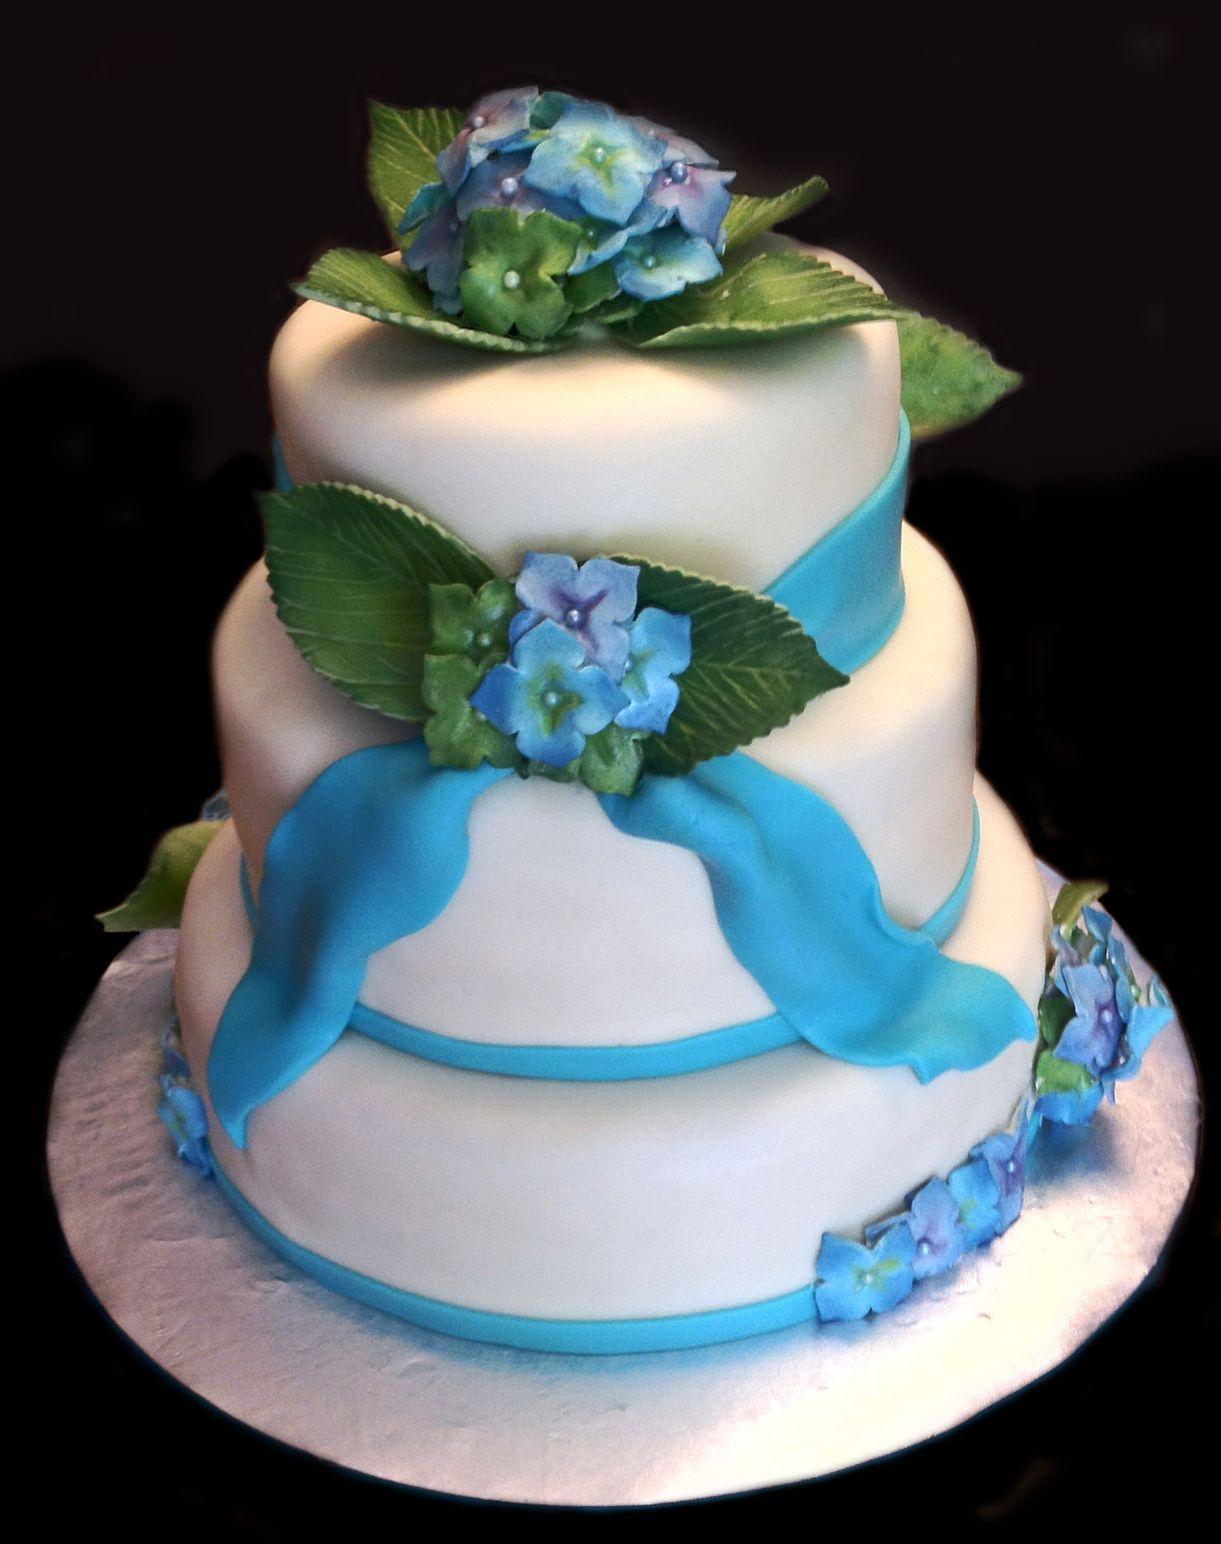 Hydrangea wedding cake | Wedding cake hydrangea, Cake ...